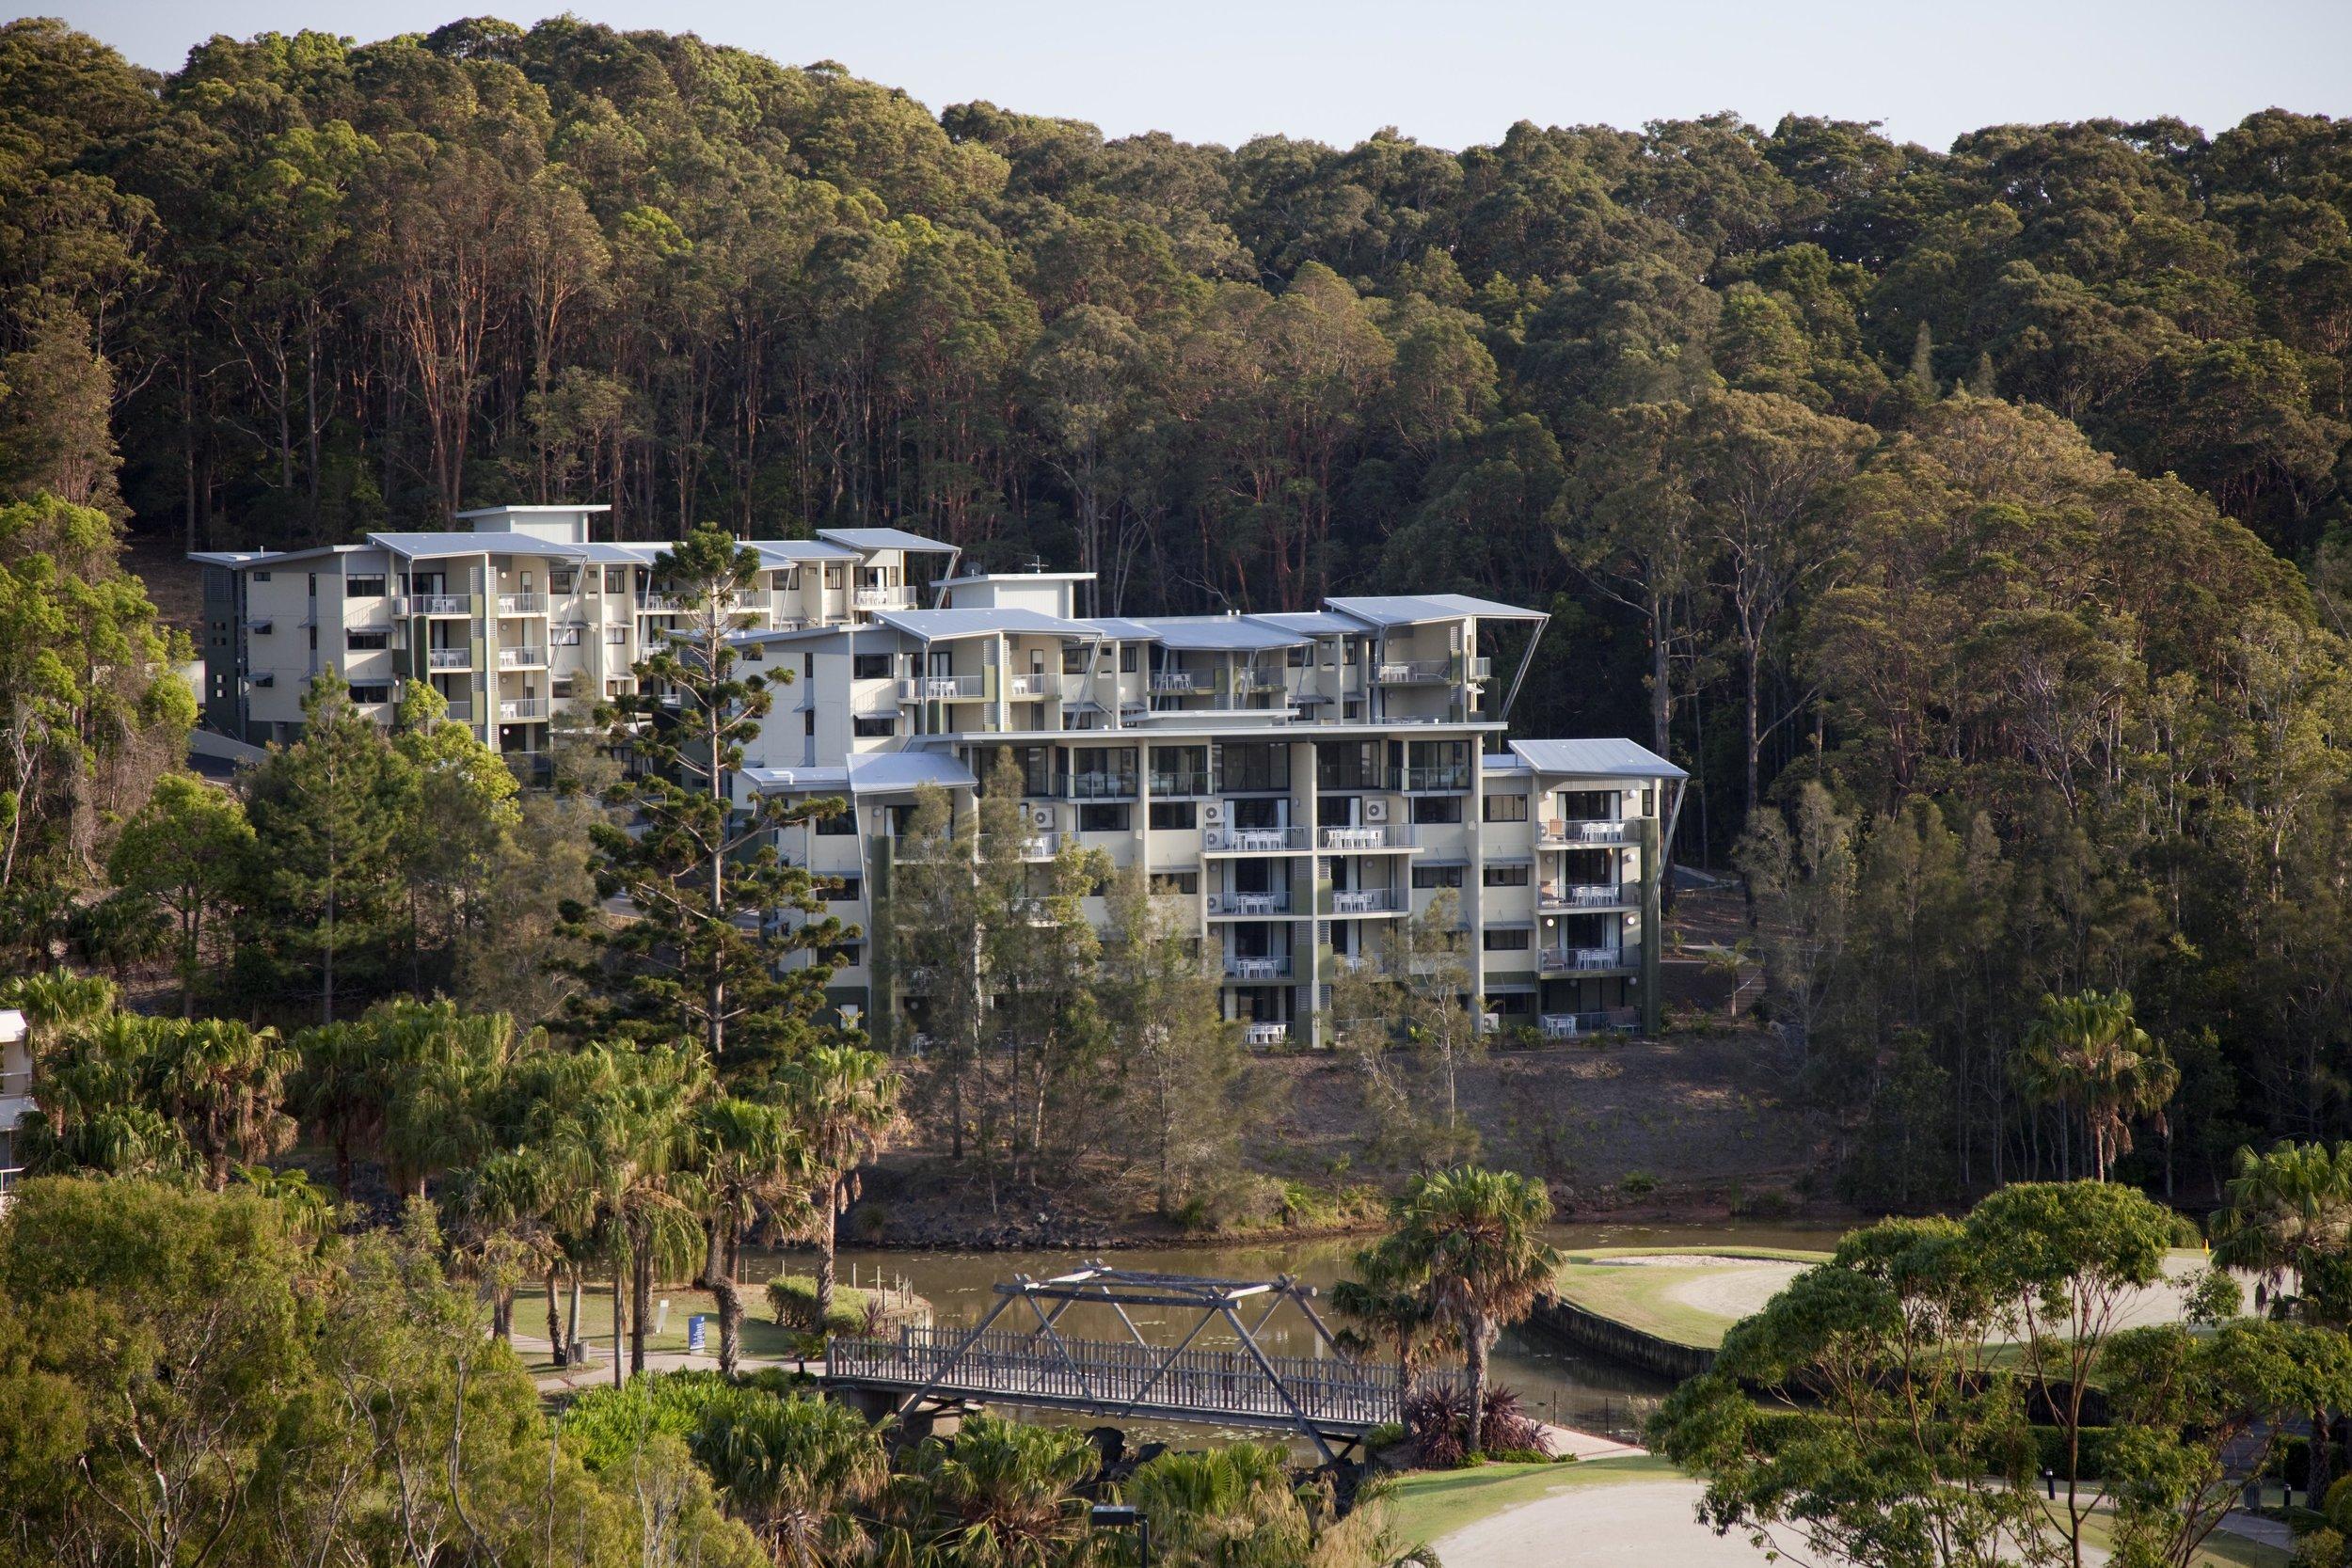 Tree-Tops-Pacific-Bay-Resort-guymer-bailey-01.jpg